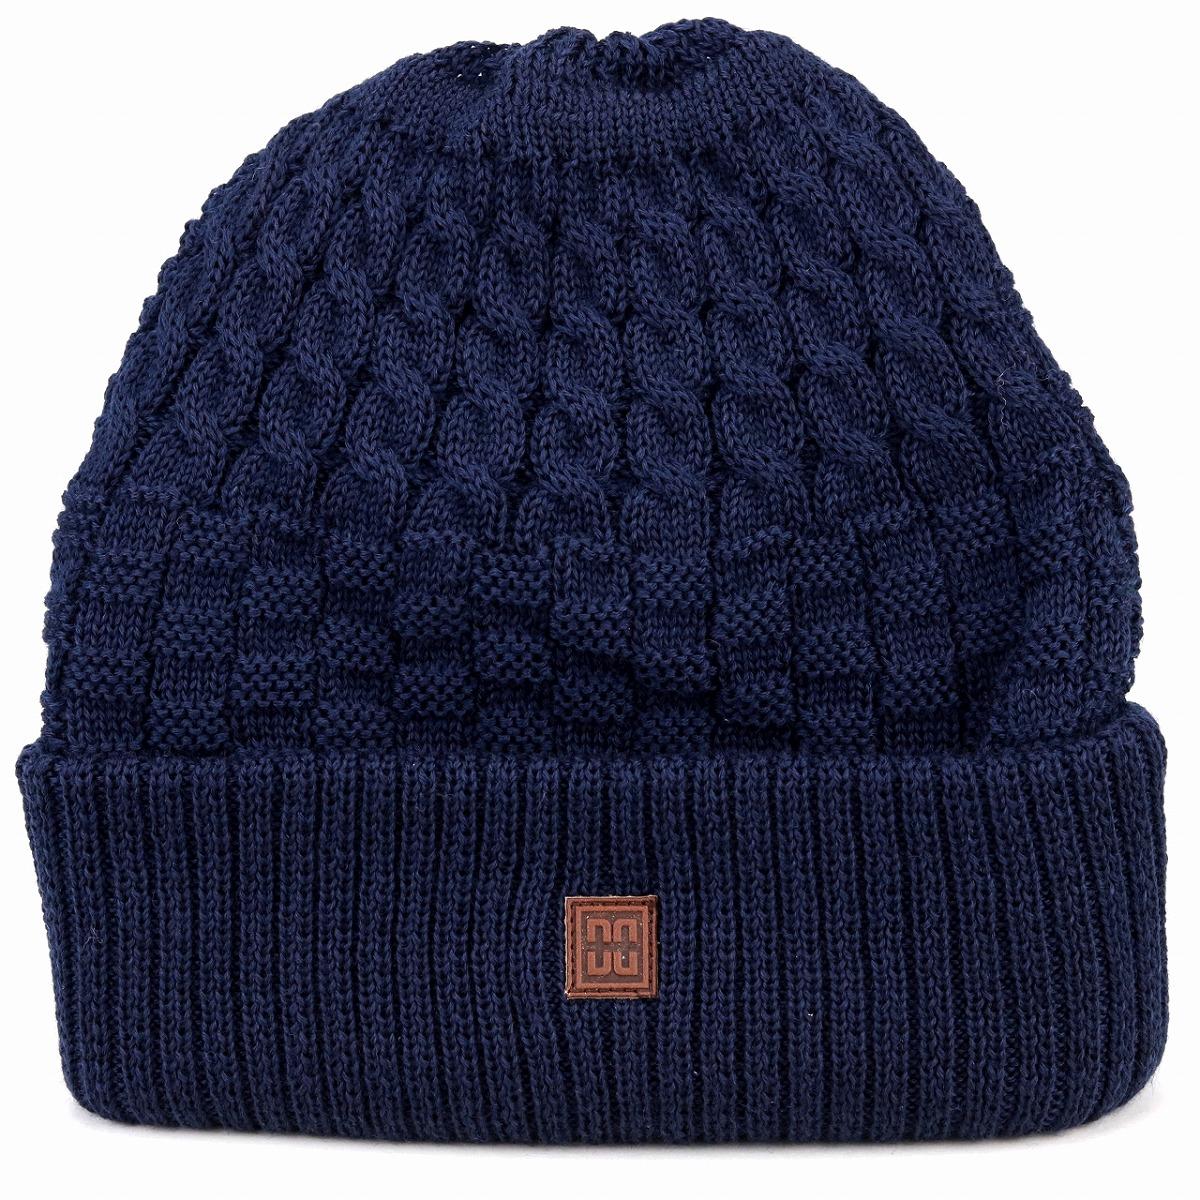 39d3db2eeb9 Simple plain cold protection dark blue navy  beanie cap  man Christmas present  hat with ニットワッチタグ made in DAKS lapel ニットワッチ wool blend CADET48 ...